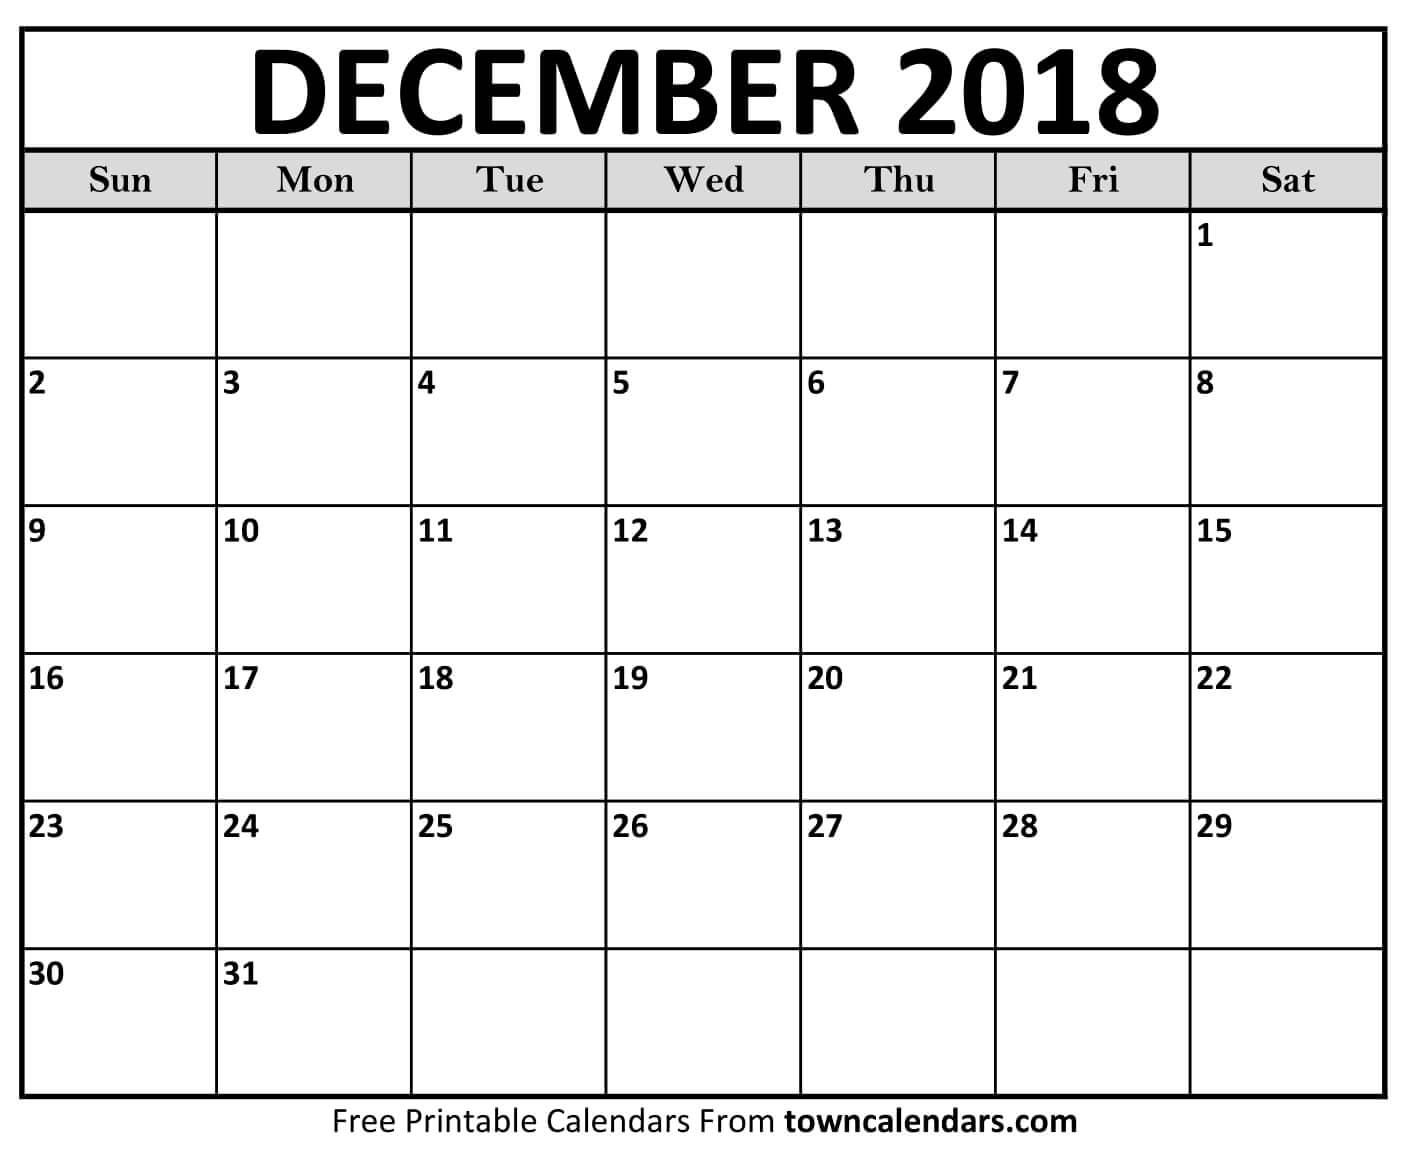 Printable 2018 December Calendar Template - Printable Calendar 2019 intended for Blank December Calendar Printable